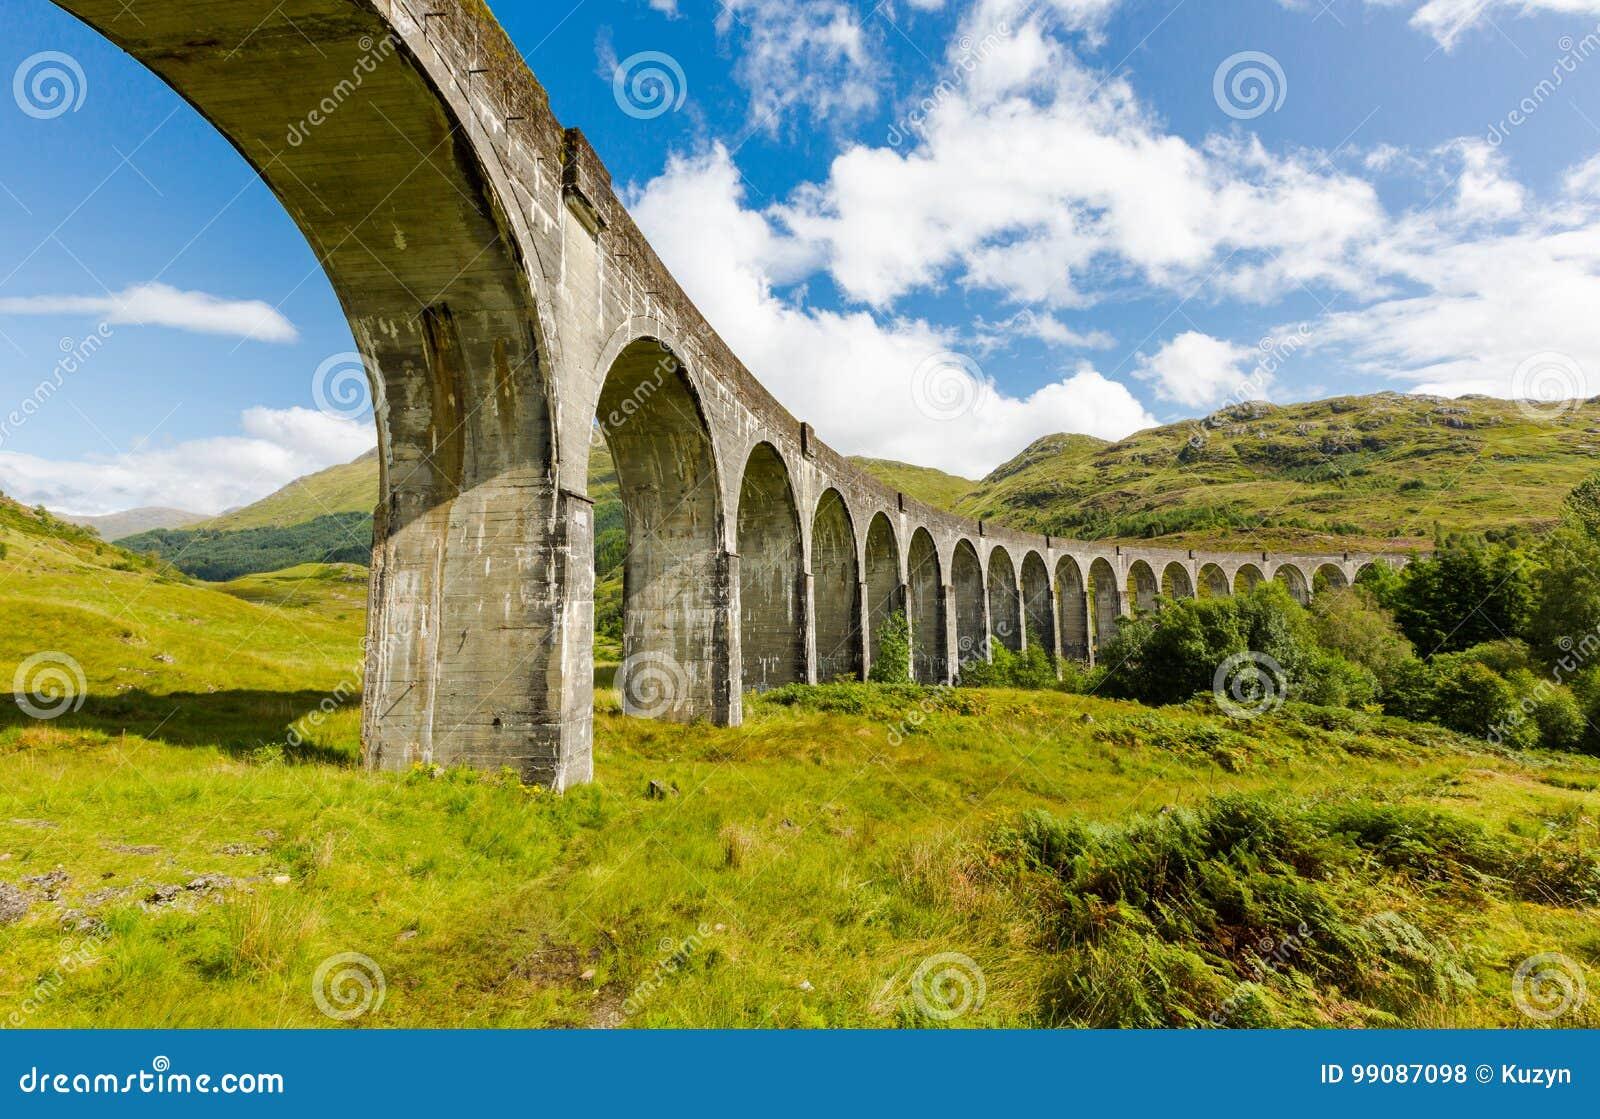 Glenfinnan historic rail viaduct in Scottish Highlands